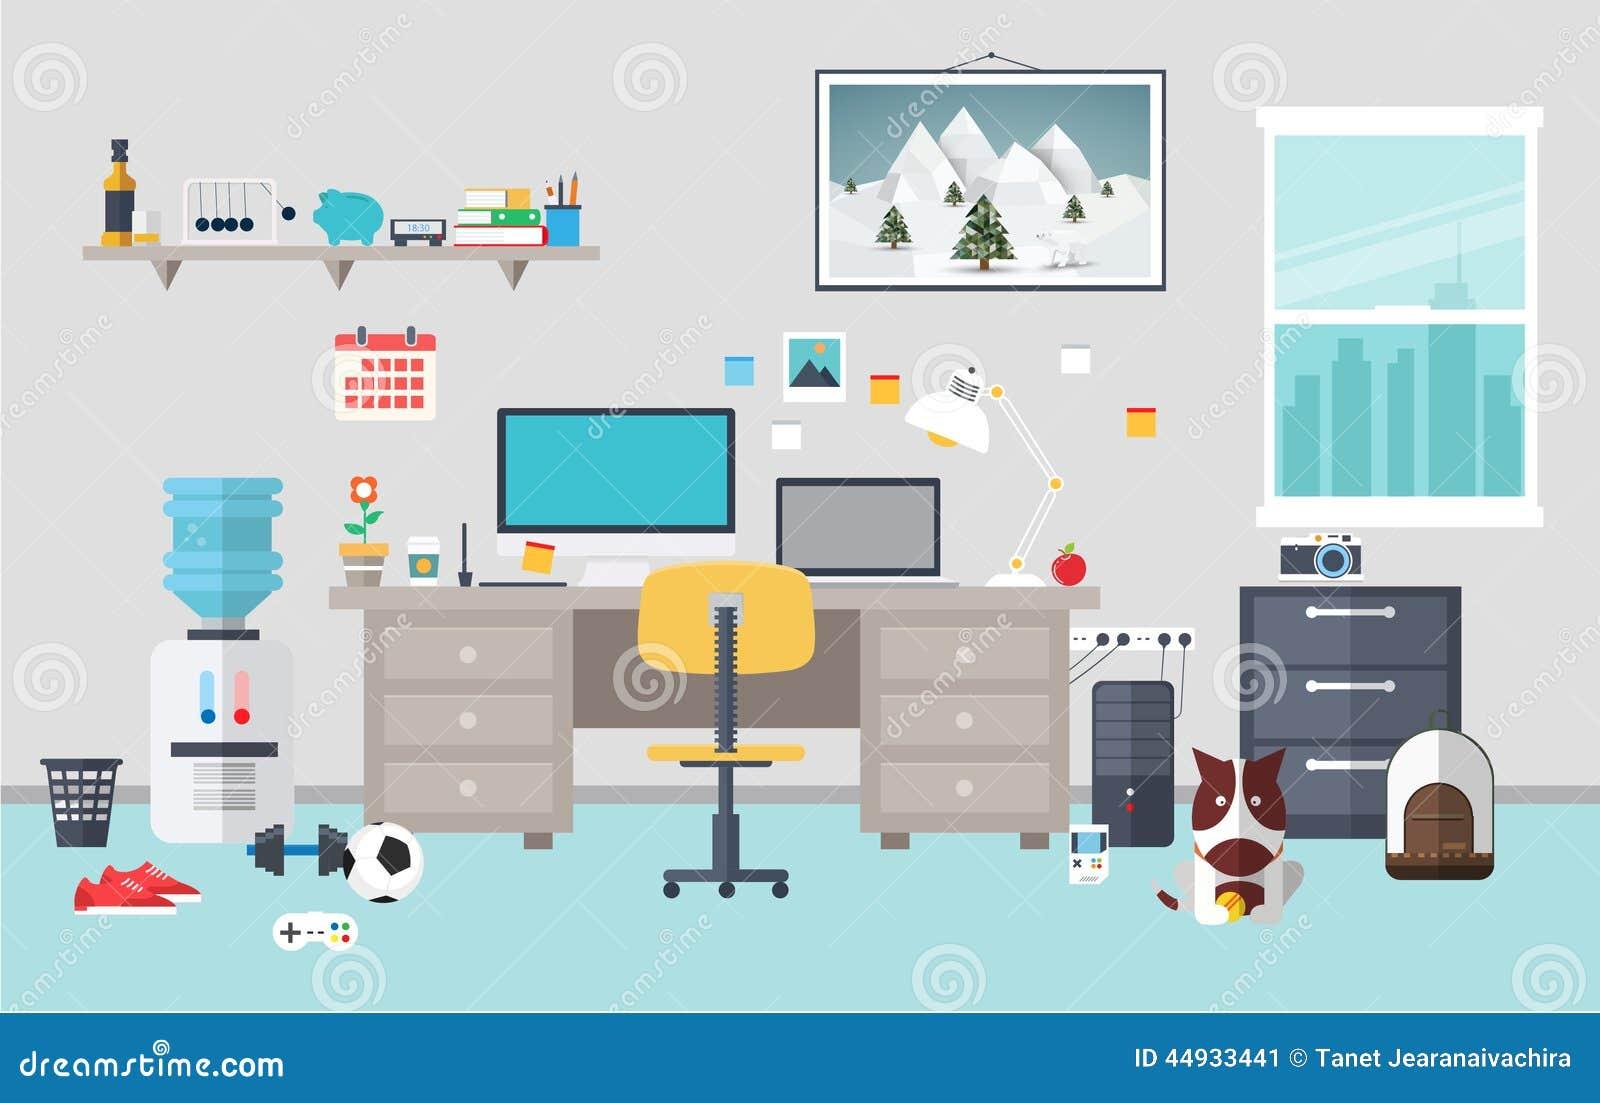 resume office